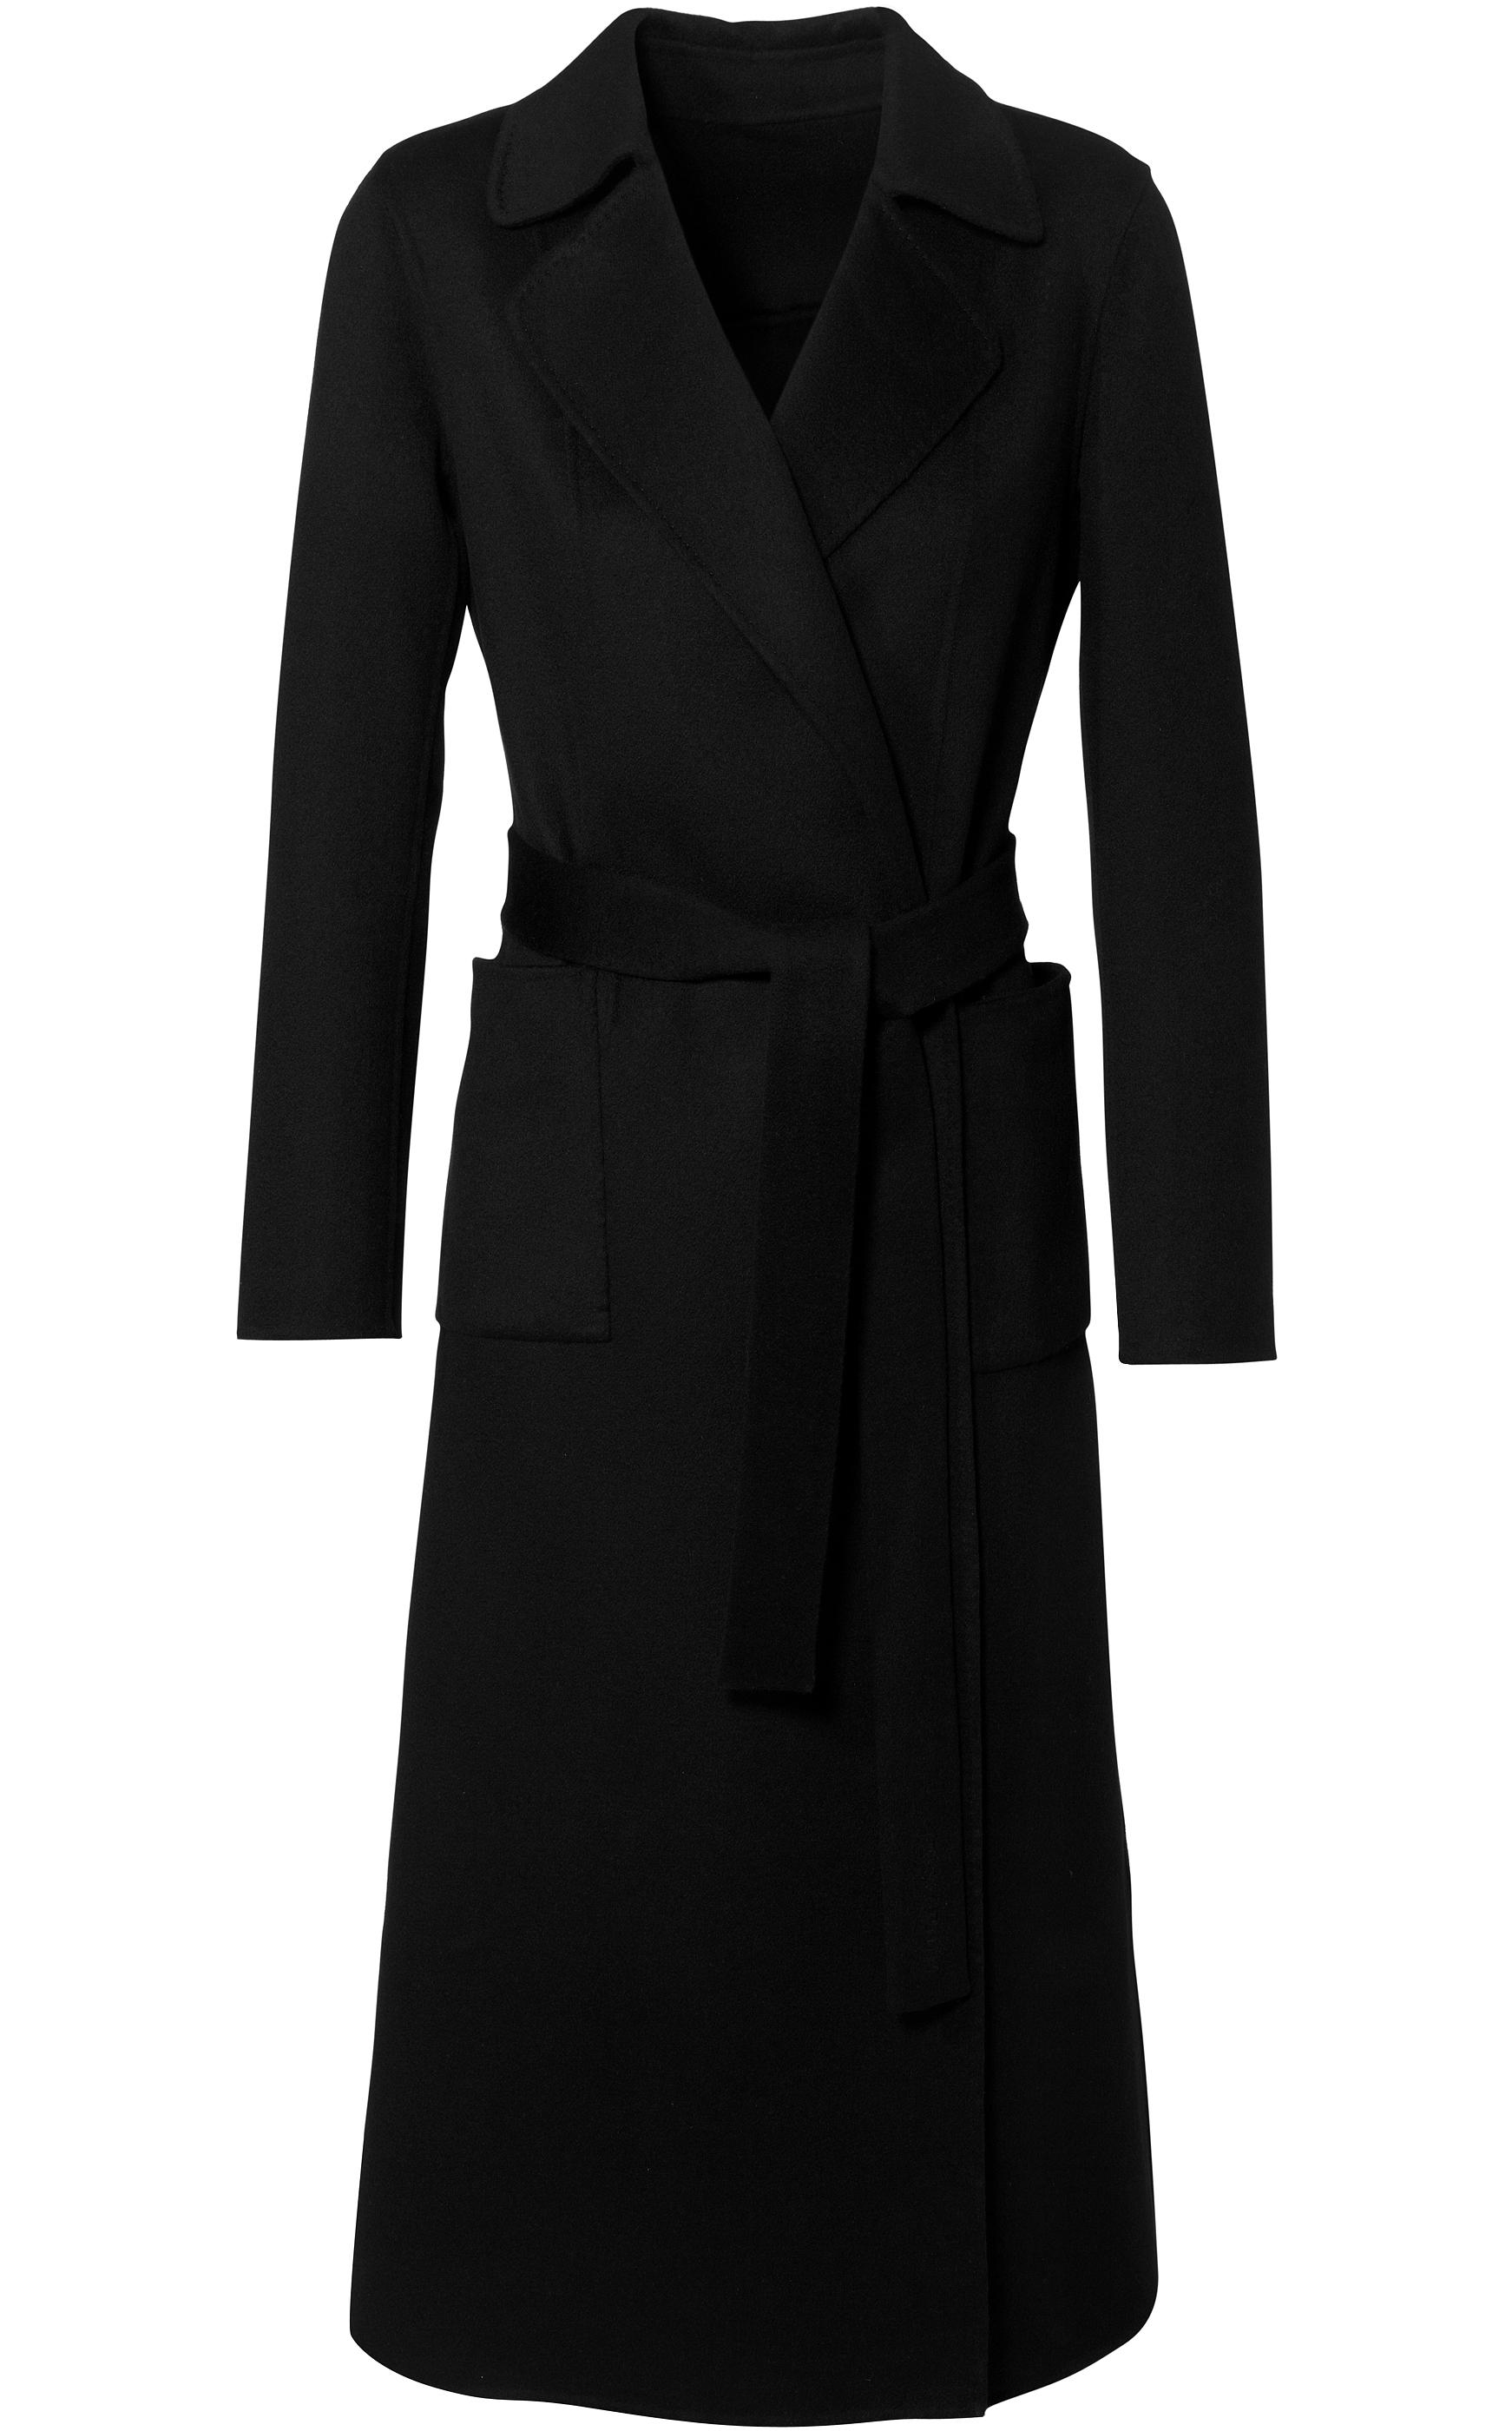 iris von arnim coat ozona in black lyst. Black Bedroom Furniture Sets. Home Design Ideas